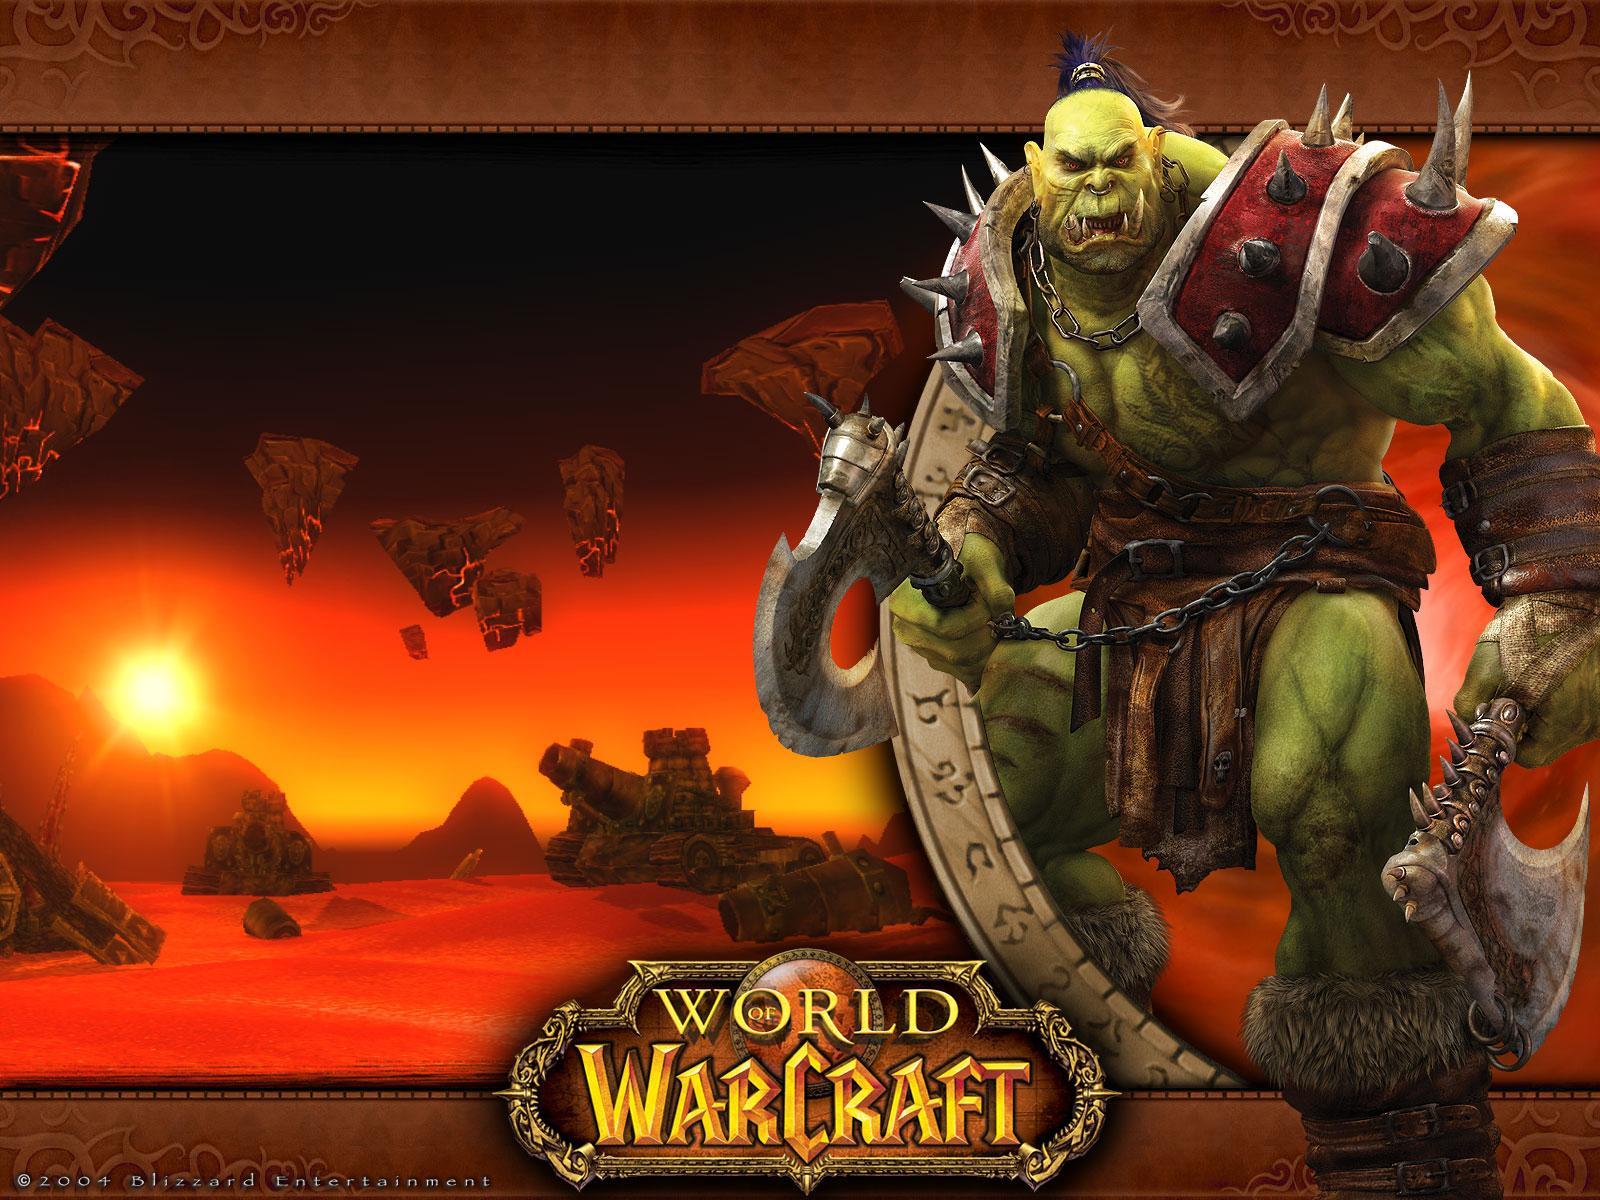 World of Warcraft movie slowly taking shape Blizzard creative chief 1600x1200